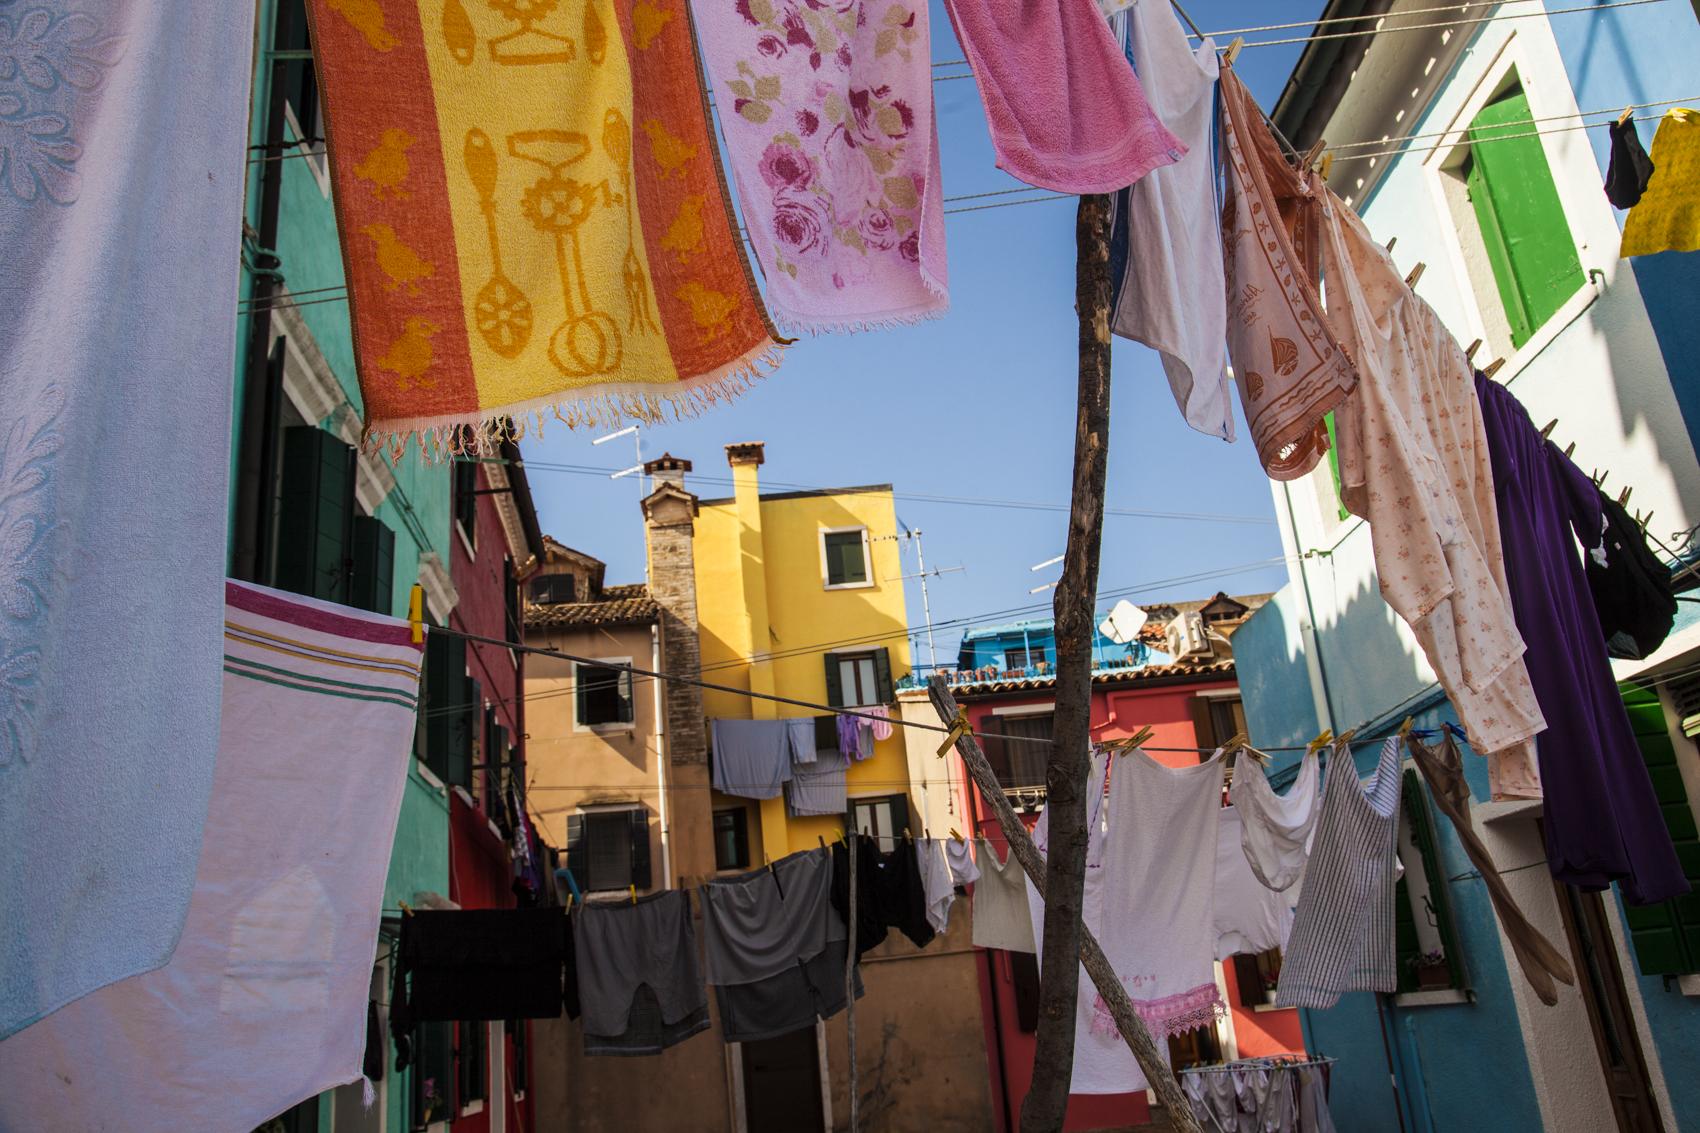 Laundry day, Burano